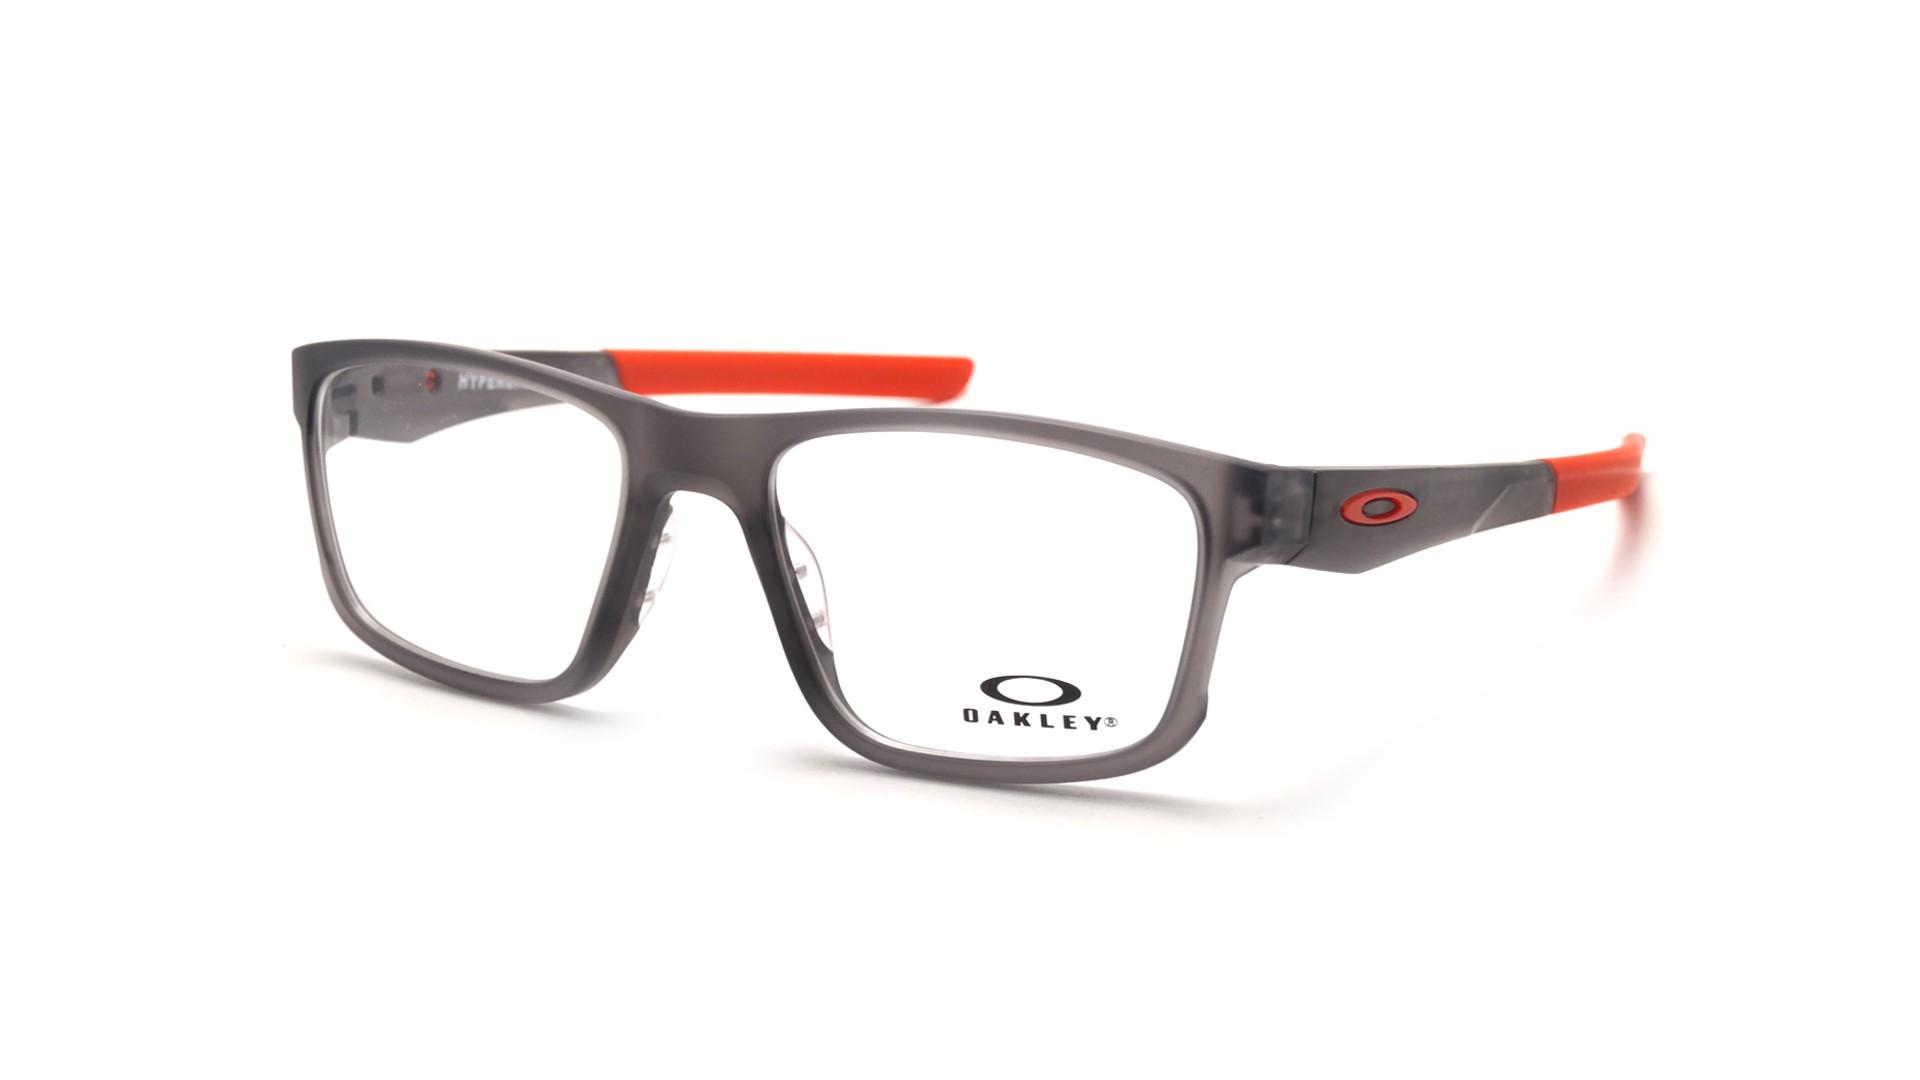 d96eecb308 Eyeglasses Oakley Hyperlink Grey Matte OX8078 05 52-18 Medium